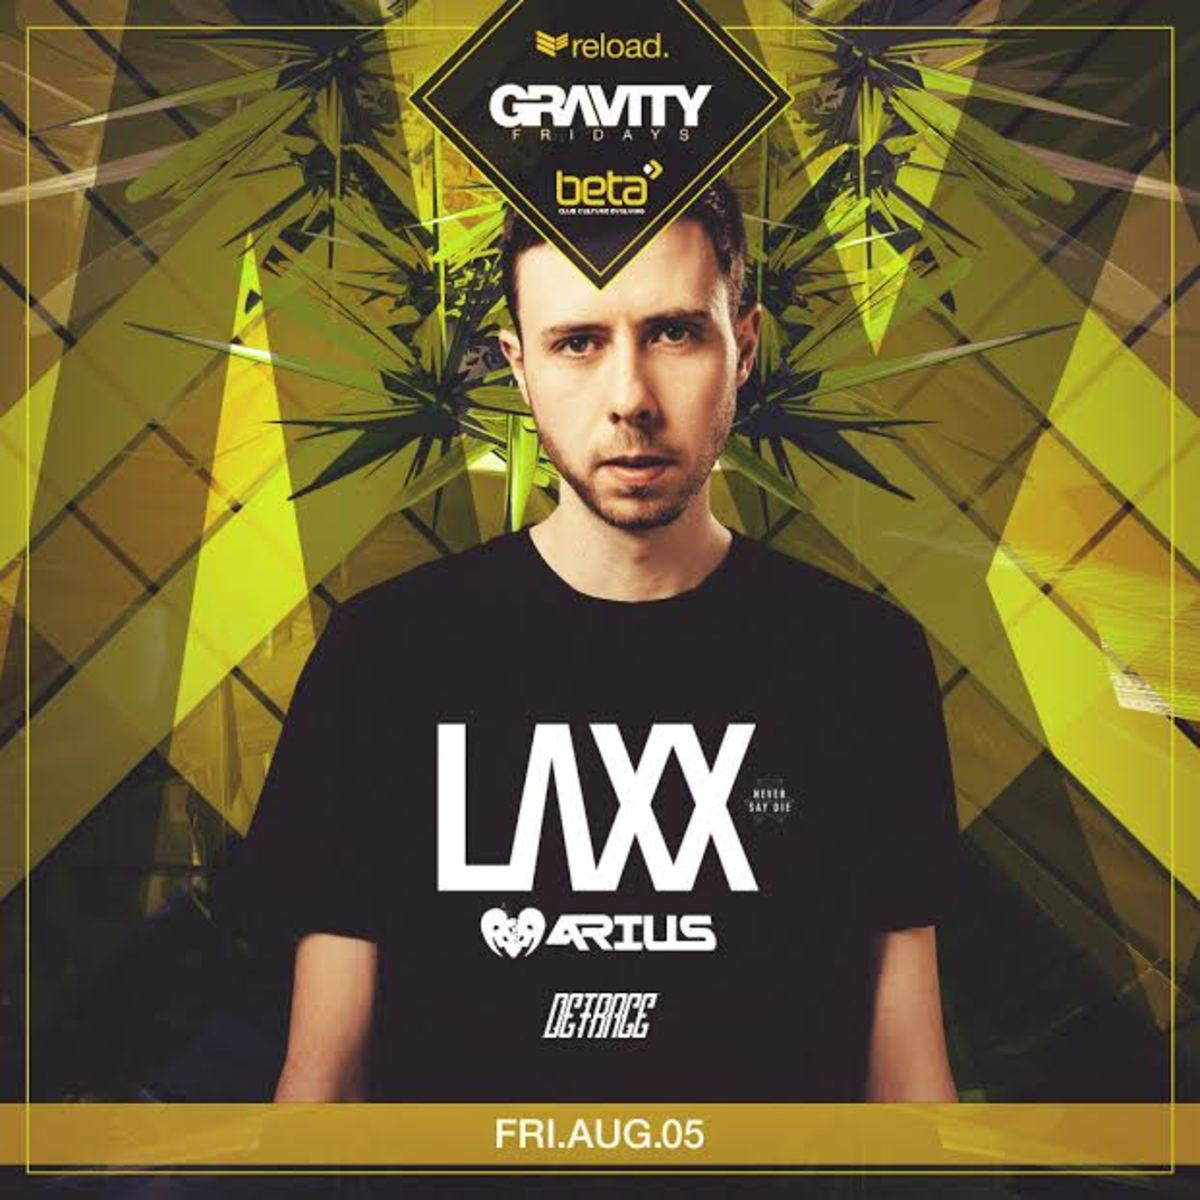 LAXX Beta Nightclub August 5th flyer